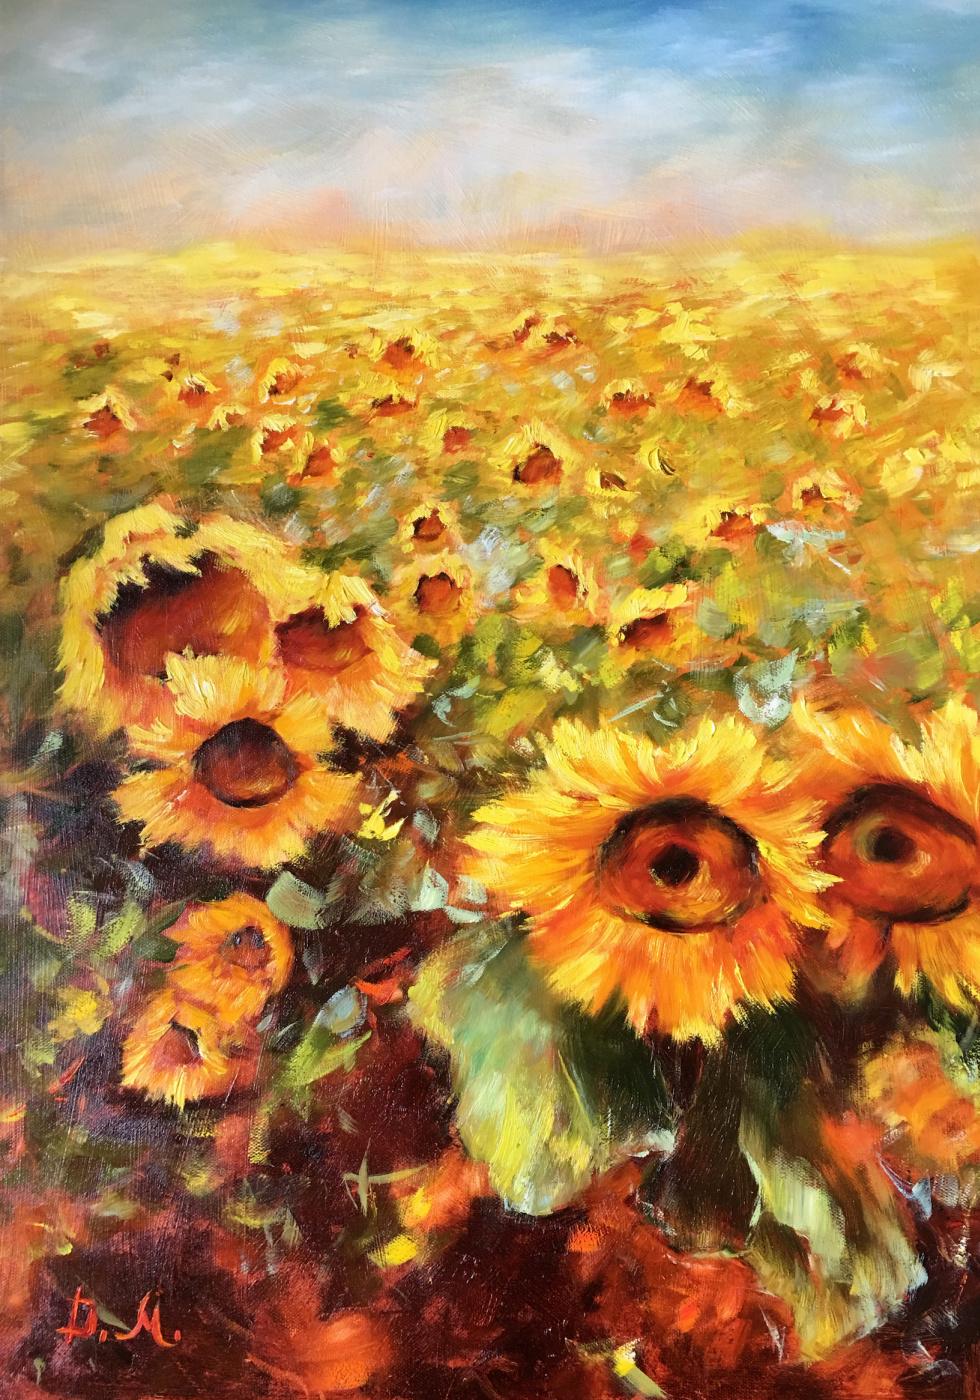 Диана Владимировна Маливани. Sunflowers